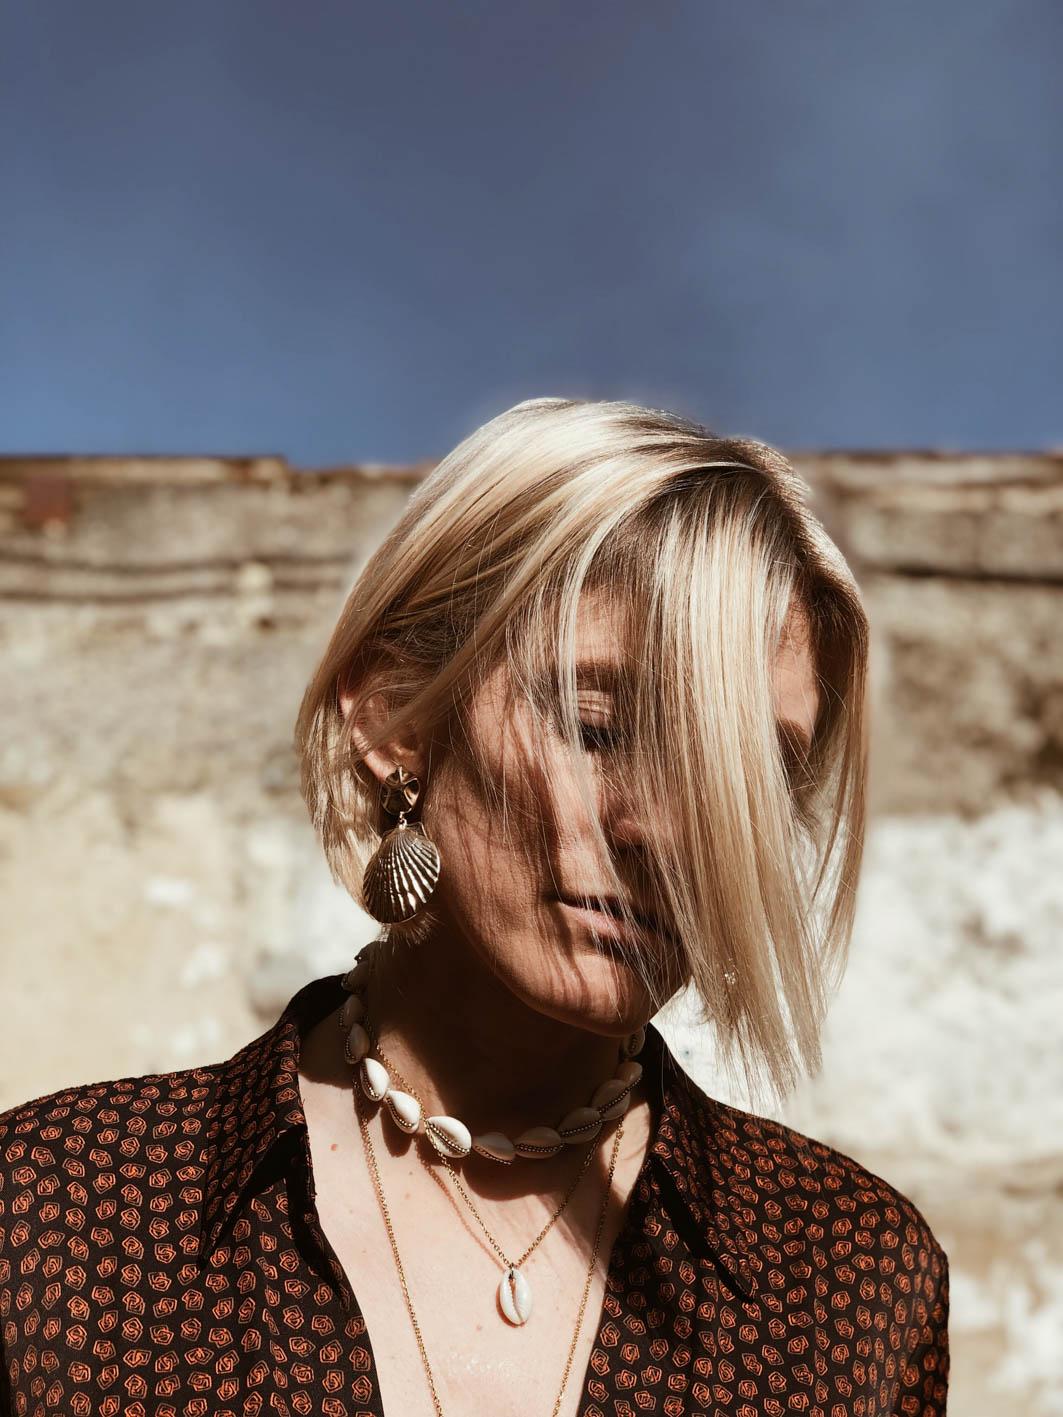 Carnet sauvage- blog mode et tendances - Bijoux coquillages4.jpg